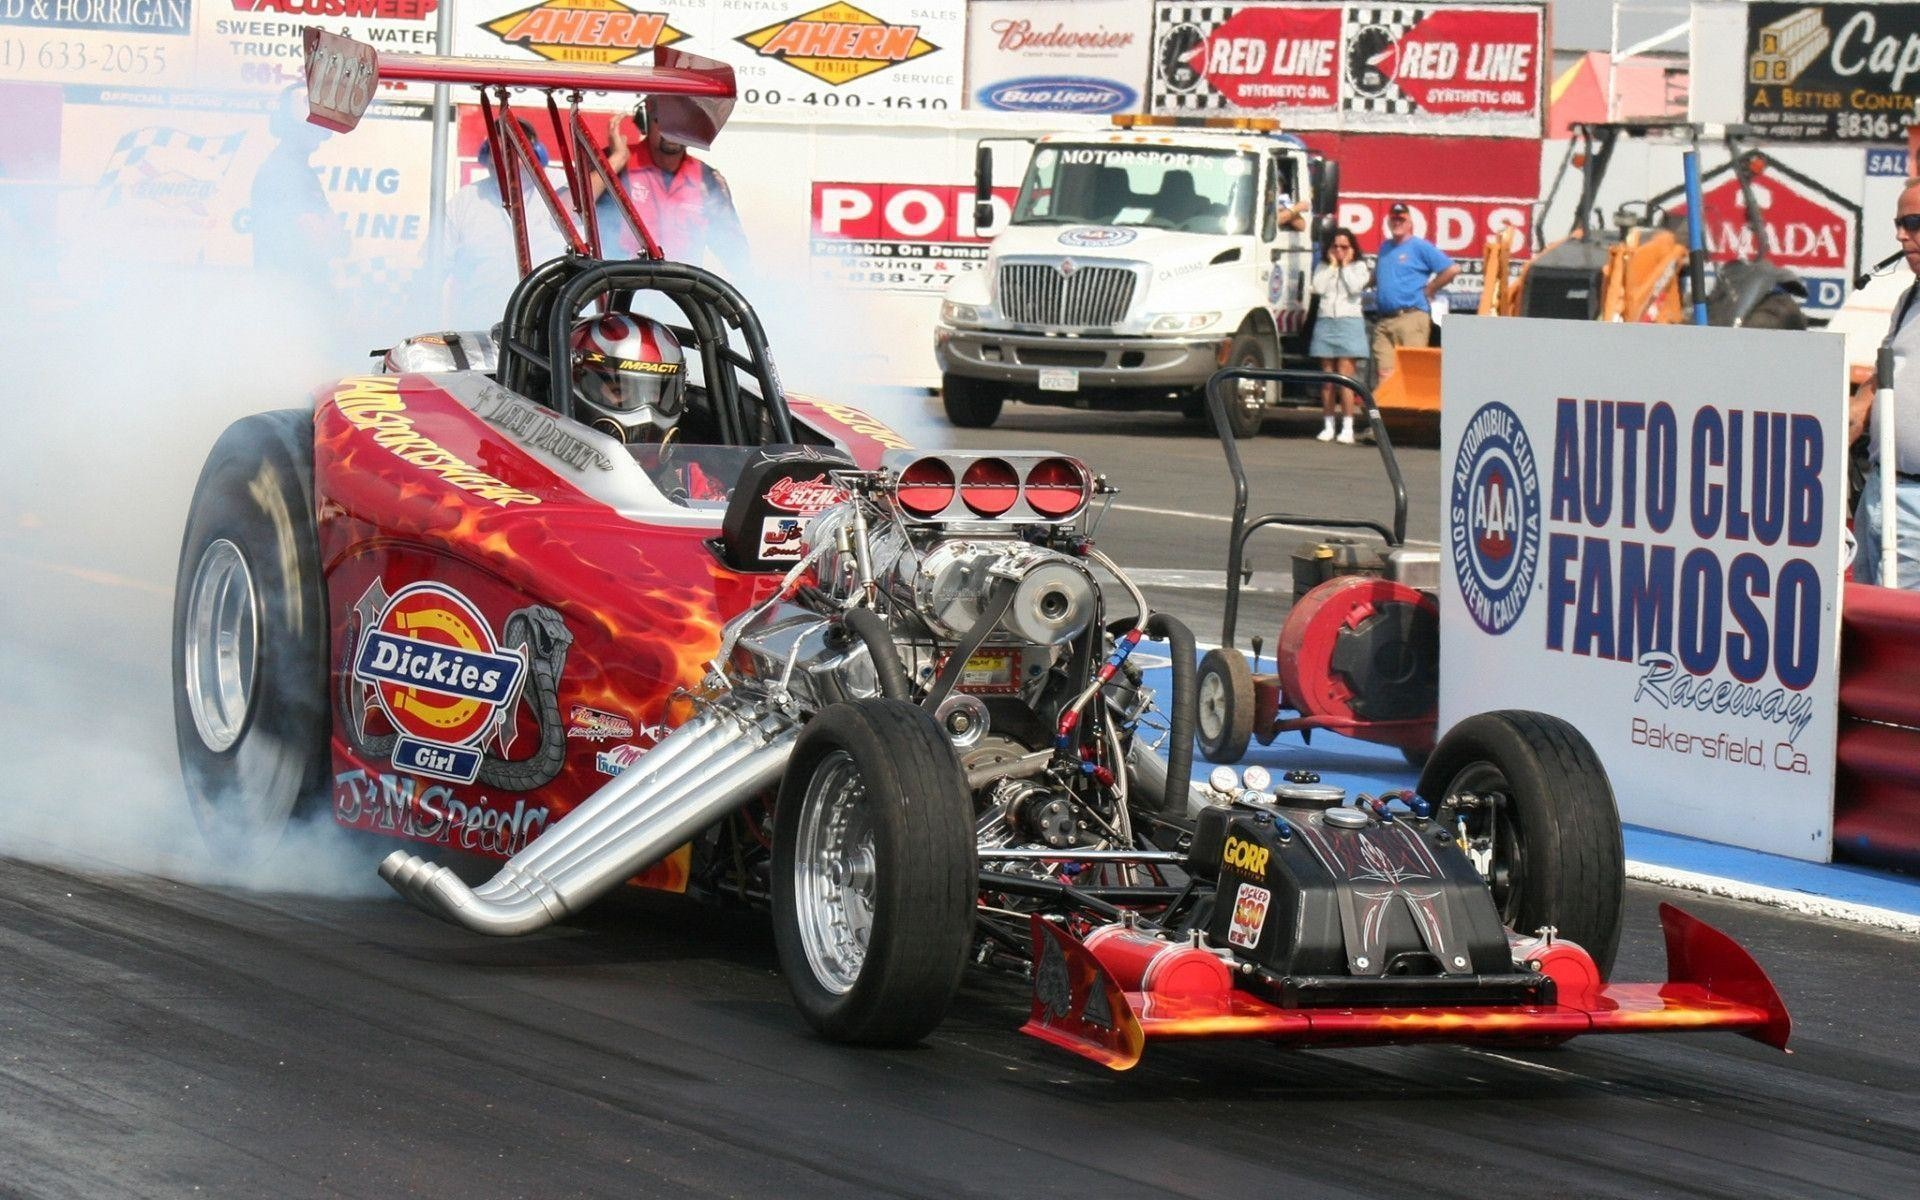 Nhra drag racing track hot rod retro engine cars wallpaper .